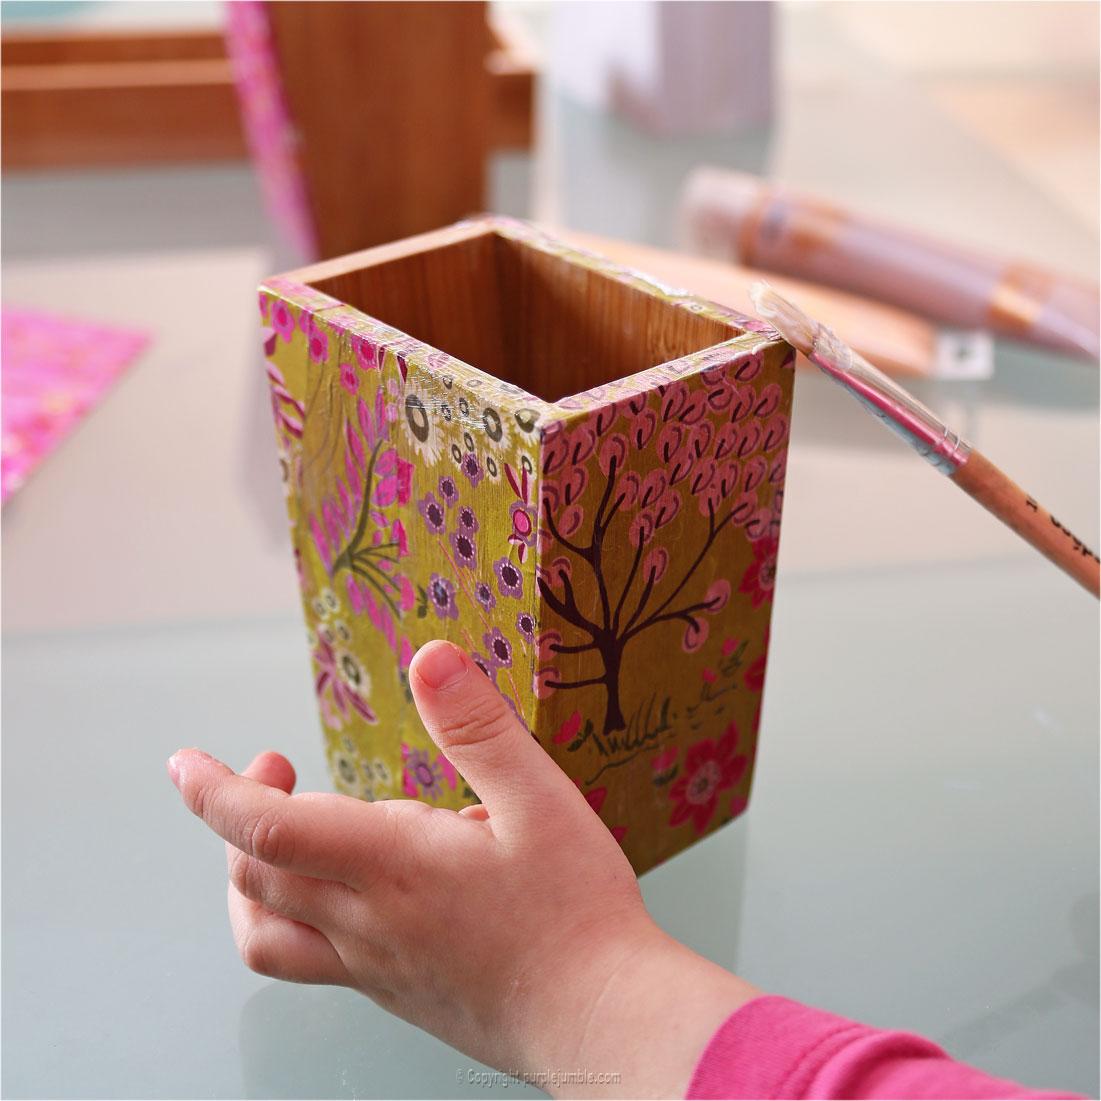 diy des pots crayons customis s purple jumble. Black Bedroom Furniture Sets. Home Design Ideas